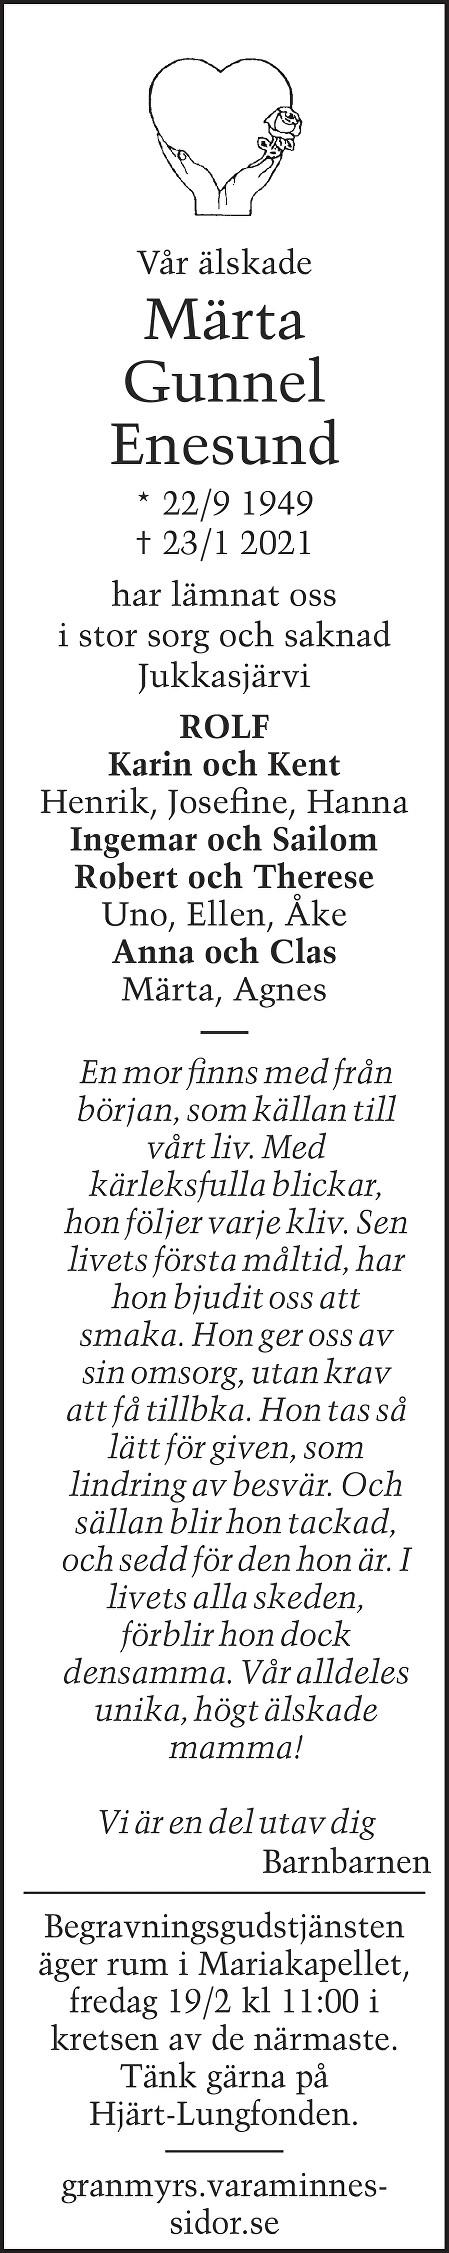 Märta Gunnel Enesund Death notice